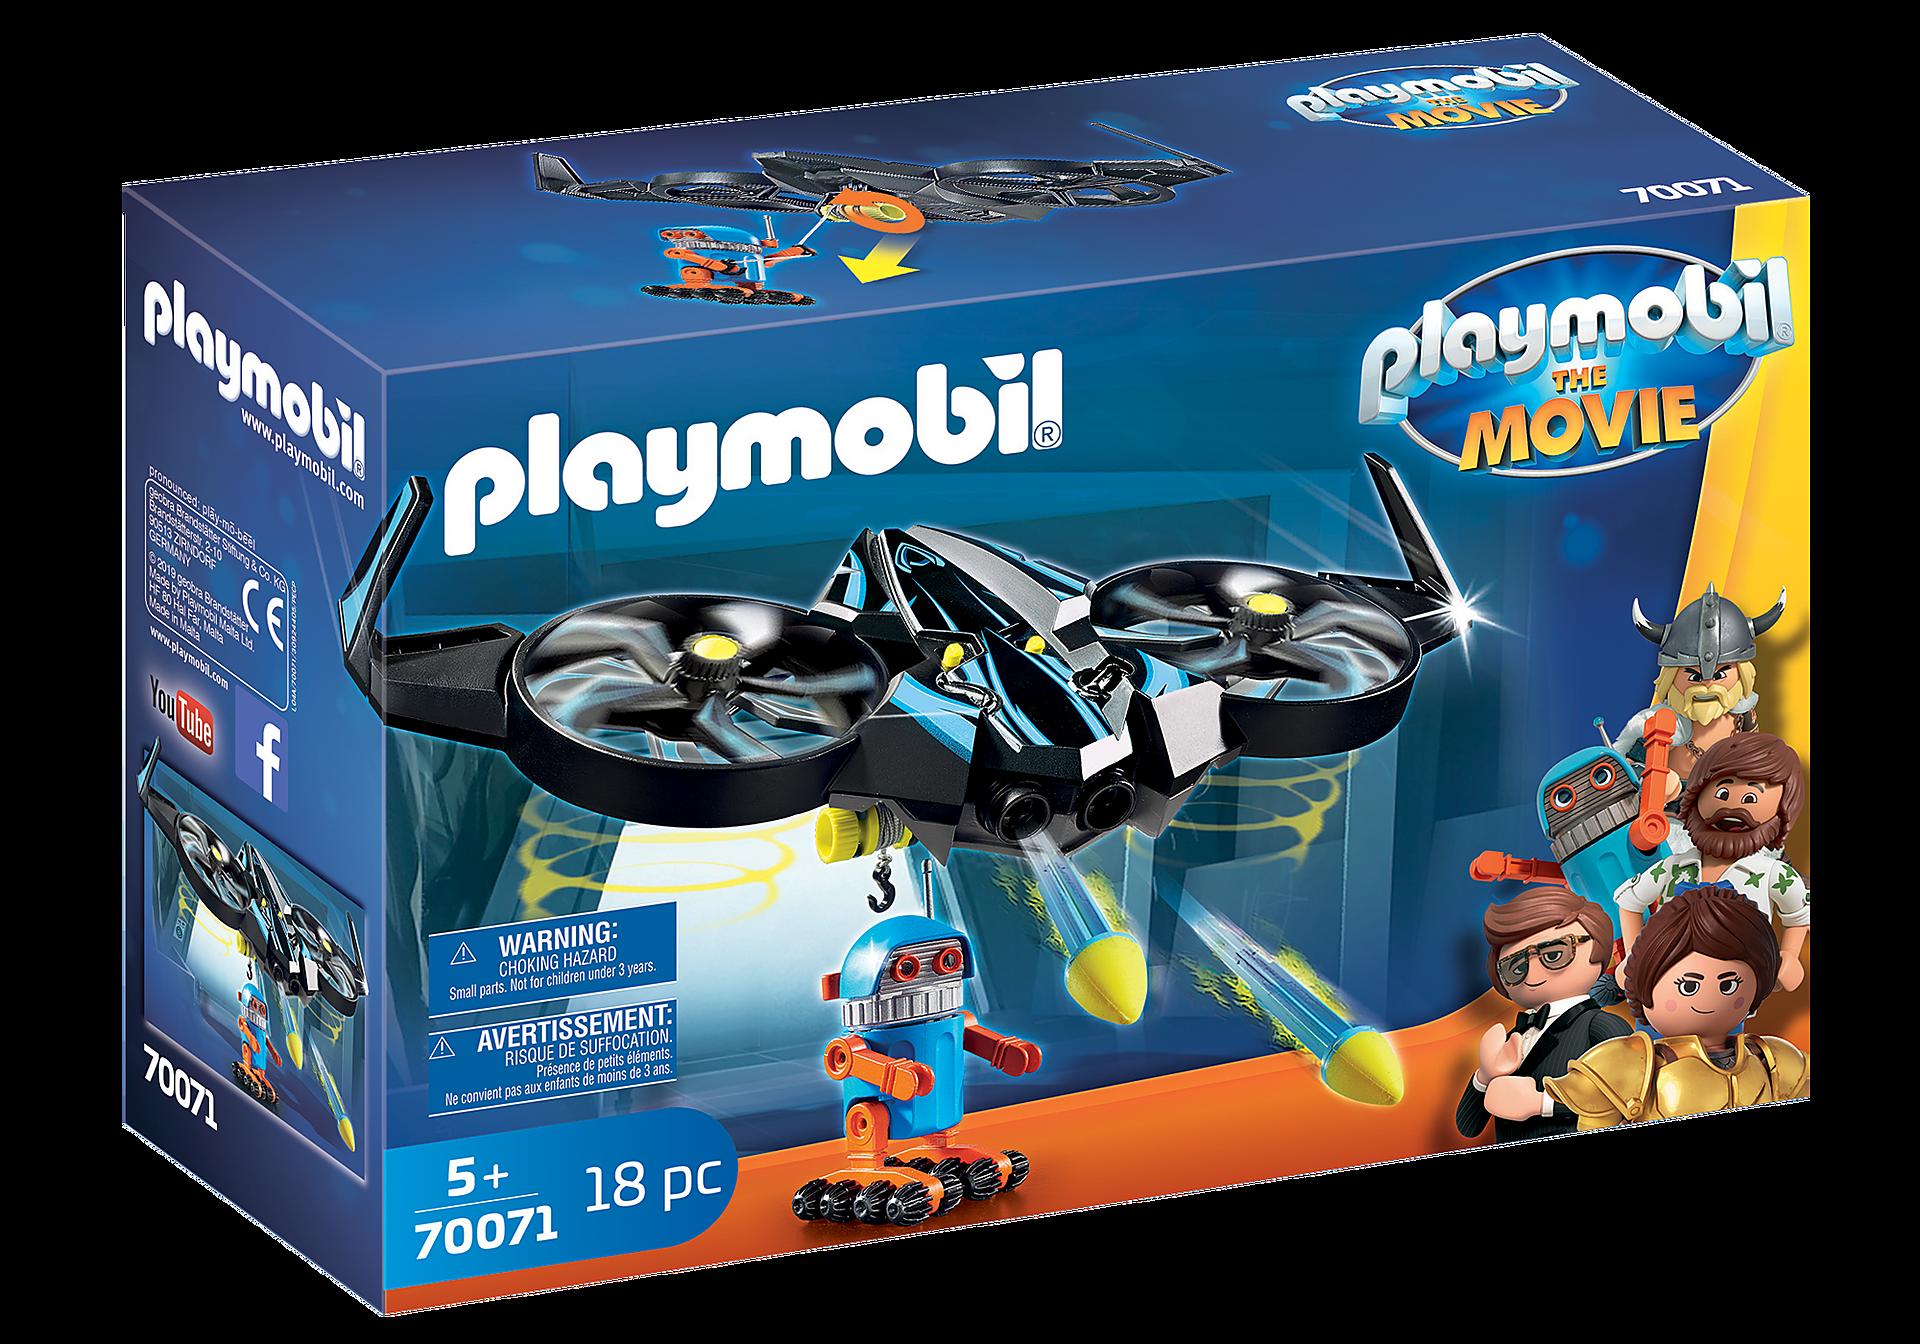 http://media.playmobil.com/i/playmobil/70071_product_box_front/PLAYMOBIL:THE MOVIE Robotitron mit Drohne